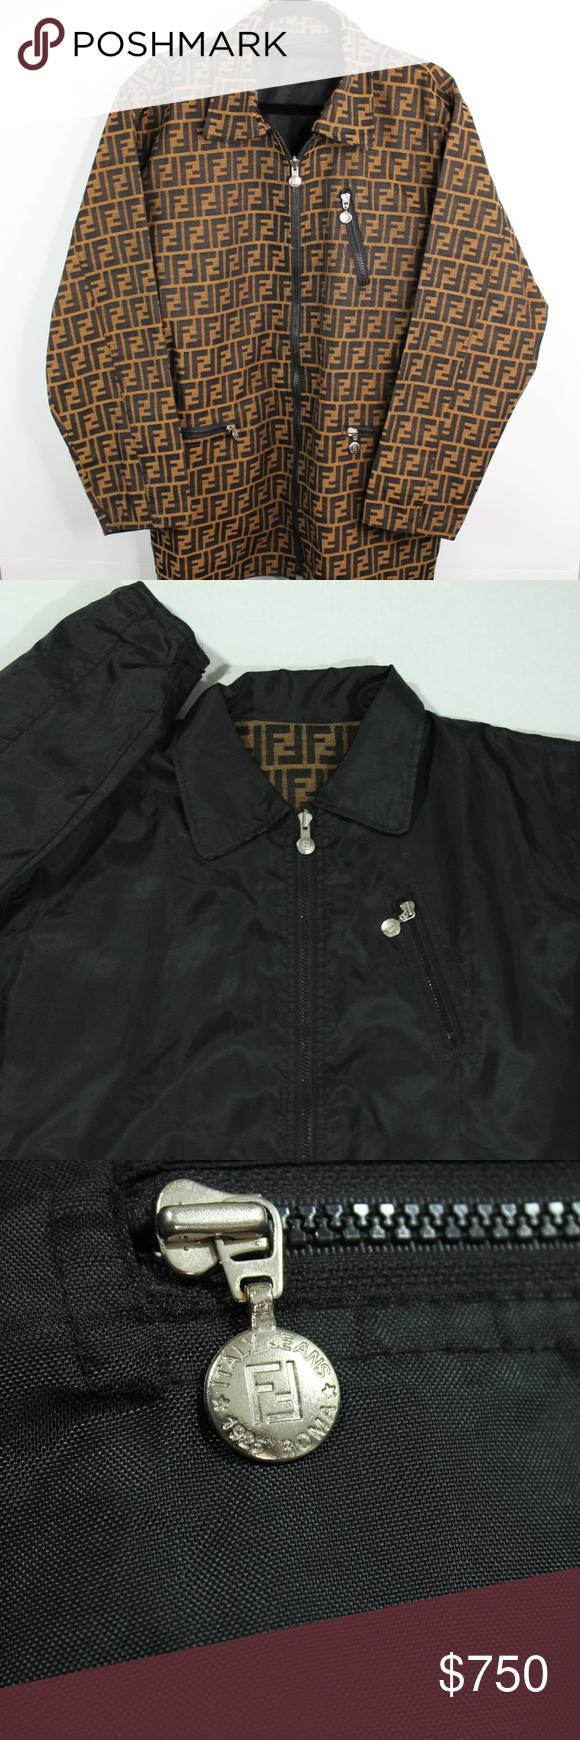 Vintage Fendi Zucca Monogram Reversible Jacket 10 Vintage Authentic Fendi Zucca Monogram Reversible Jacke Reversible Jackets Reversible Jacket Men Mens Jackets